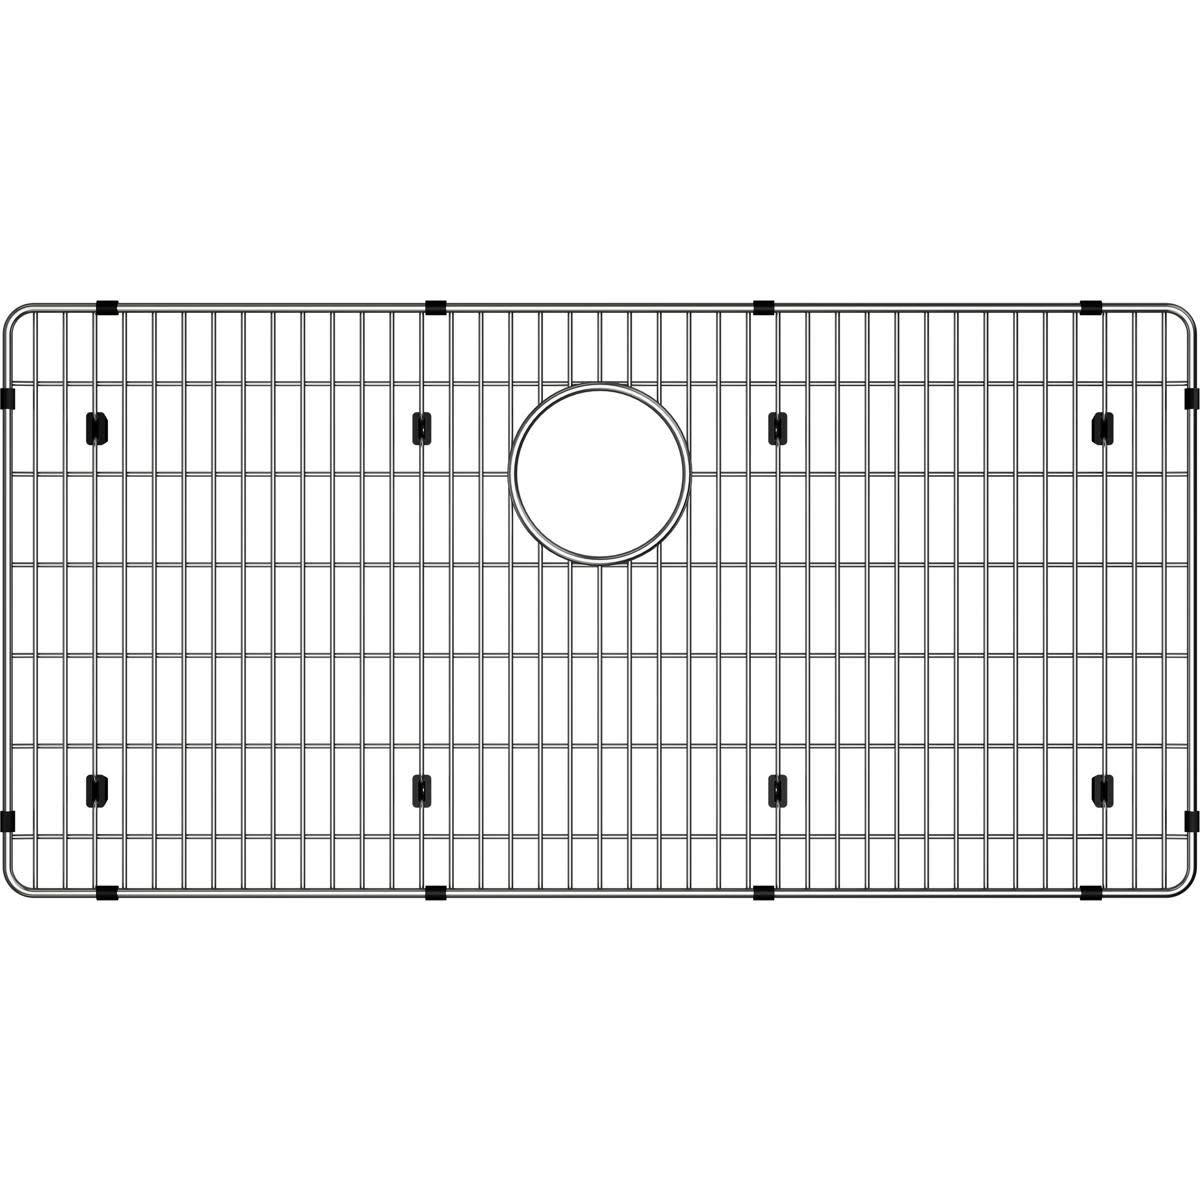 Elkay CTXBG2914 Crosstown 28-7/8'' L x 14-3/8'' W Stainless Steel Basin Rack